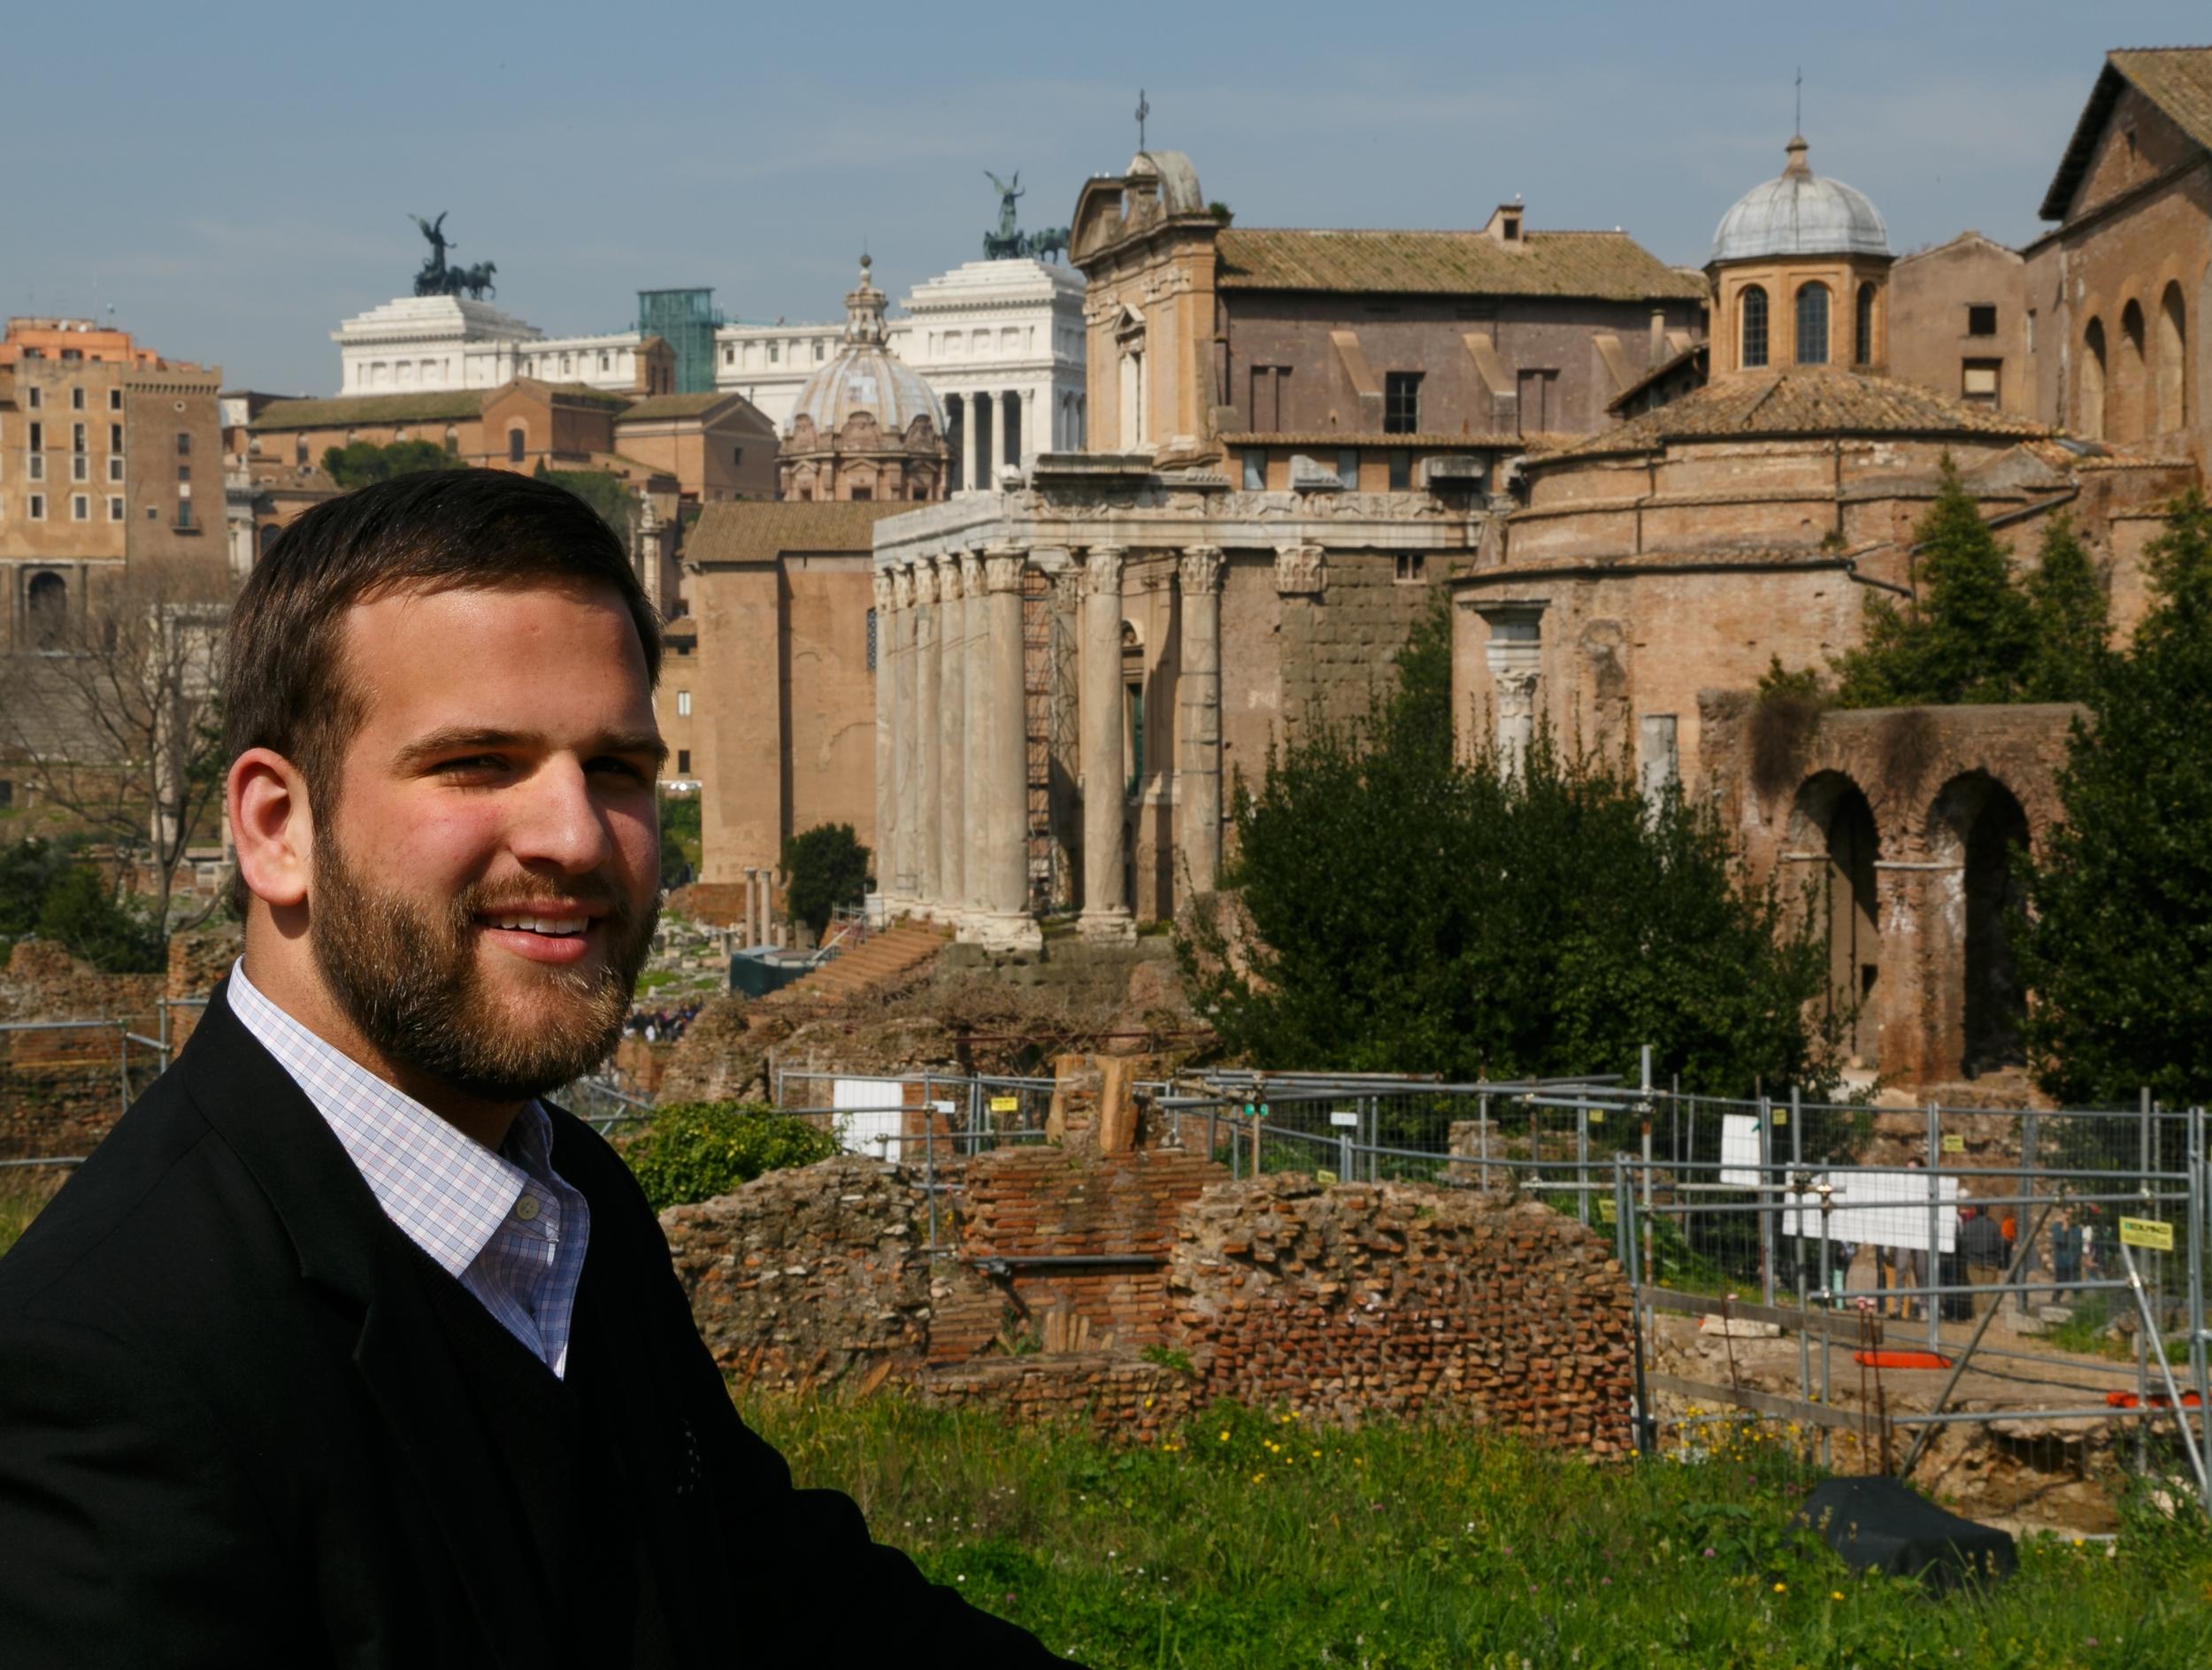 Rome_Spring_2014_1750.jpeg